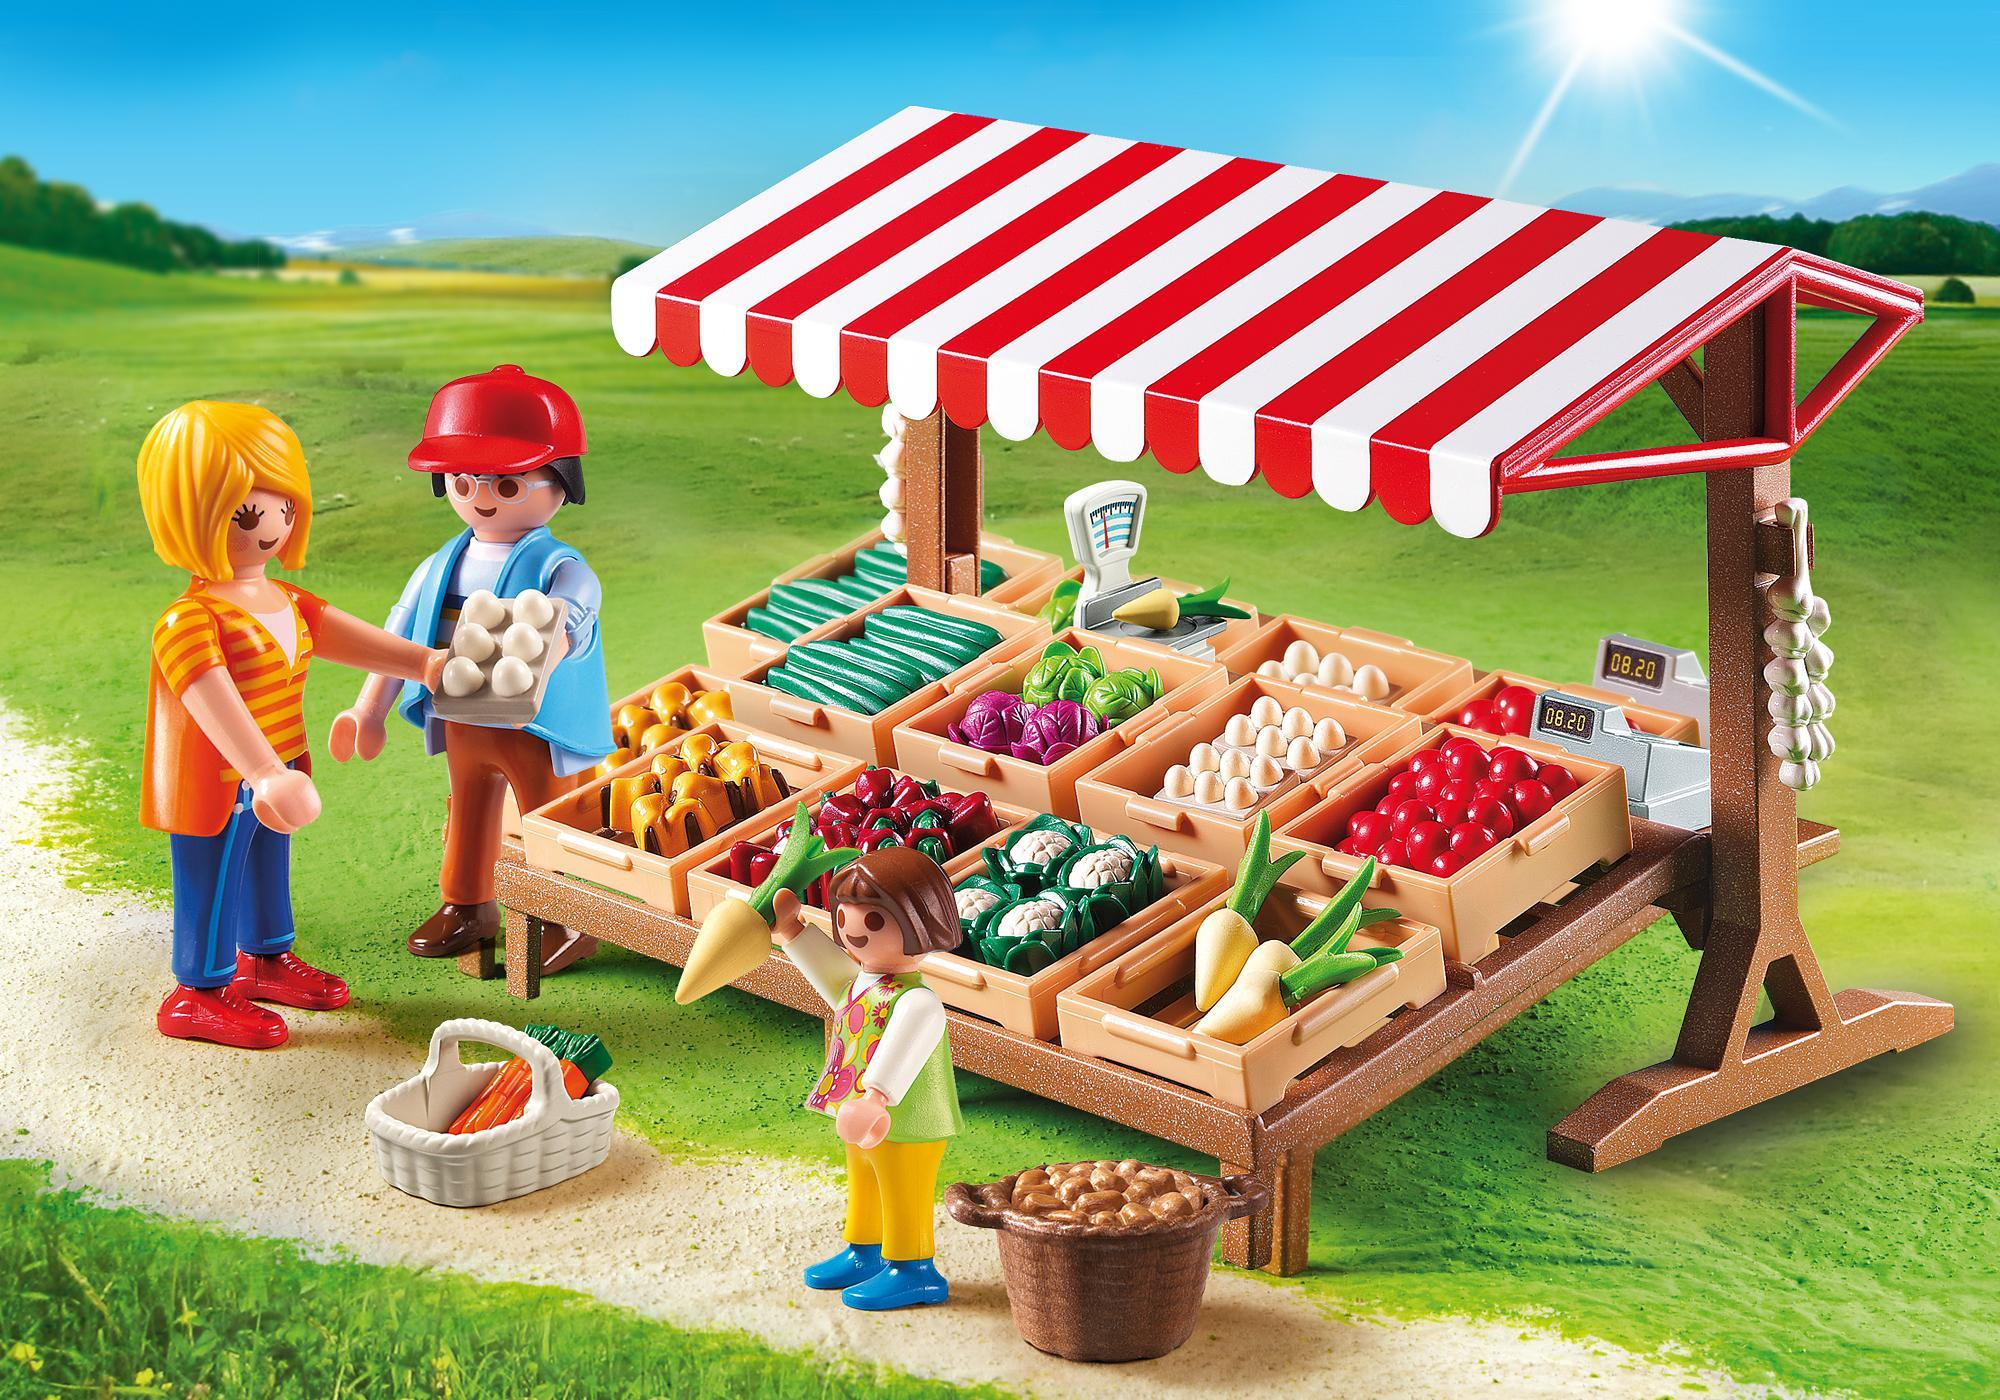 http://media.playmobil.com/i/playmobil/6121_product_detail/Stragan z warzywami